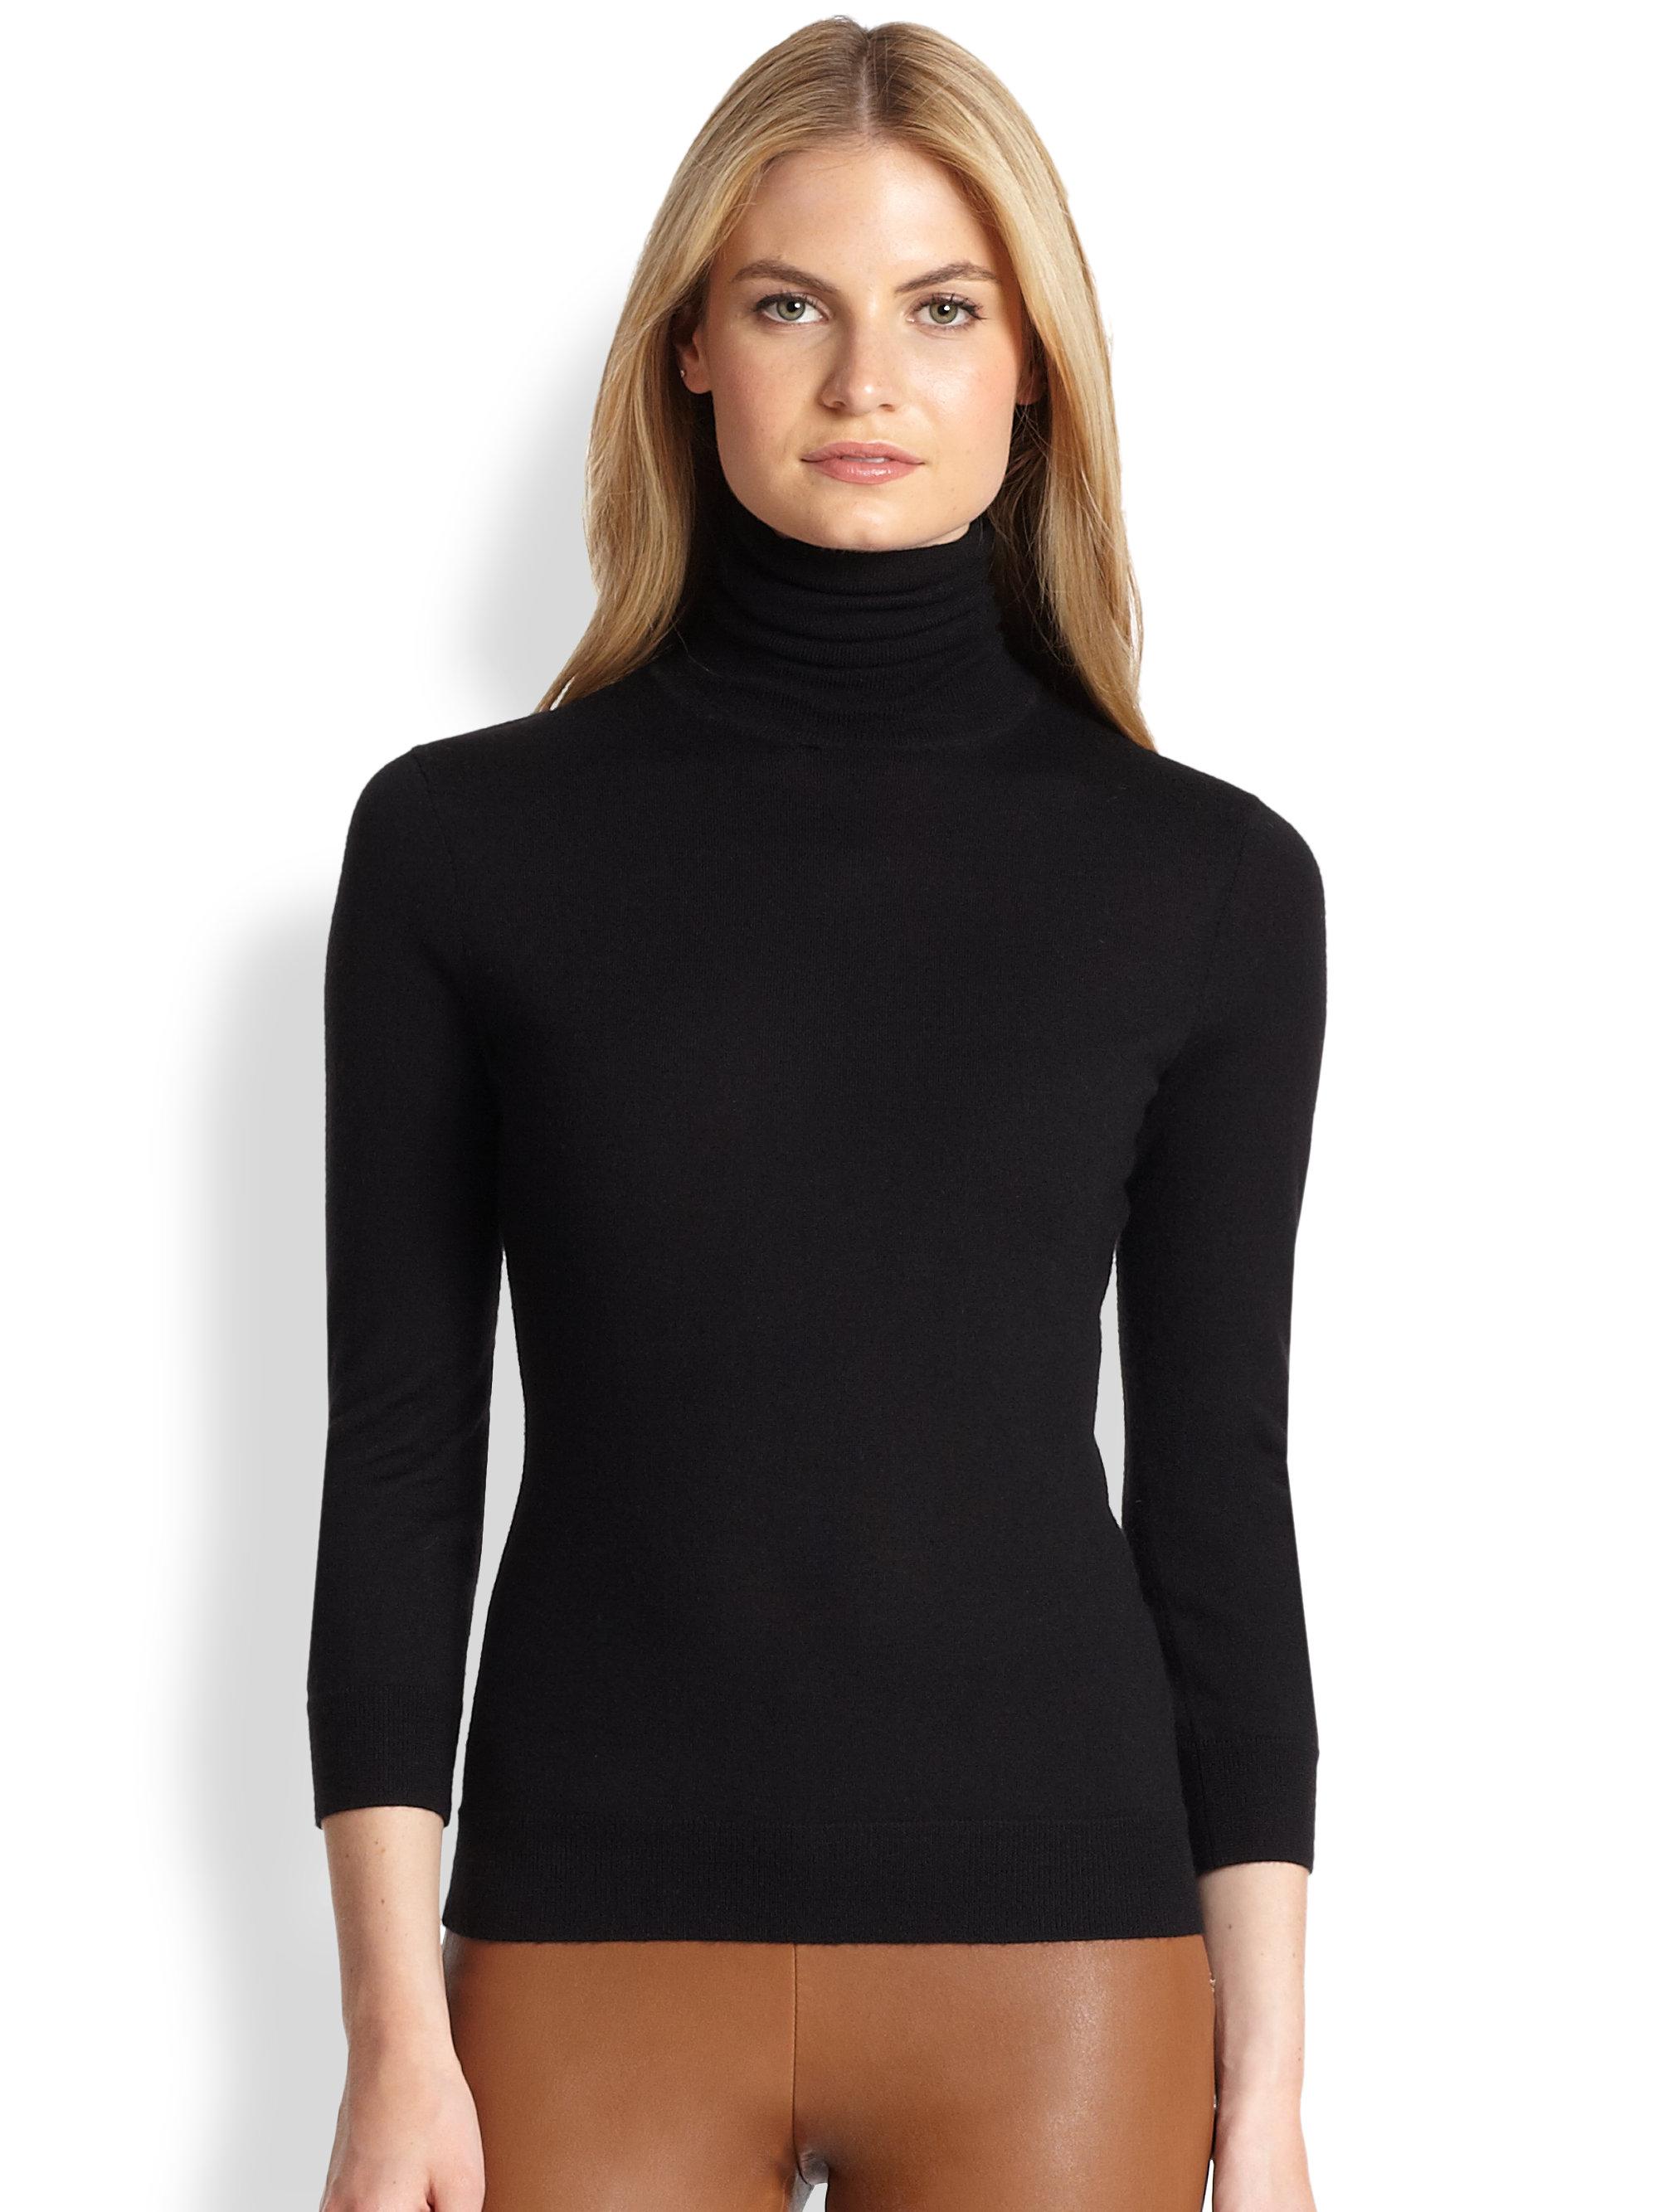 Ralph Lauren Collection Purple Label Sweater Knit Top